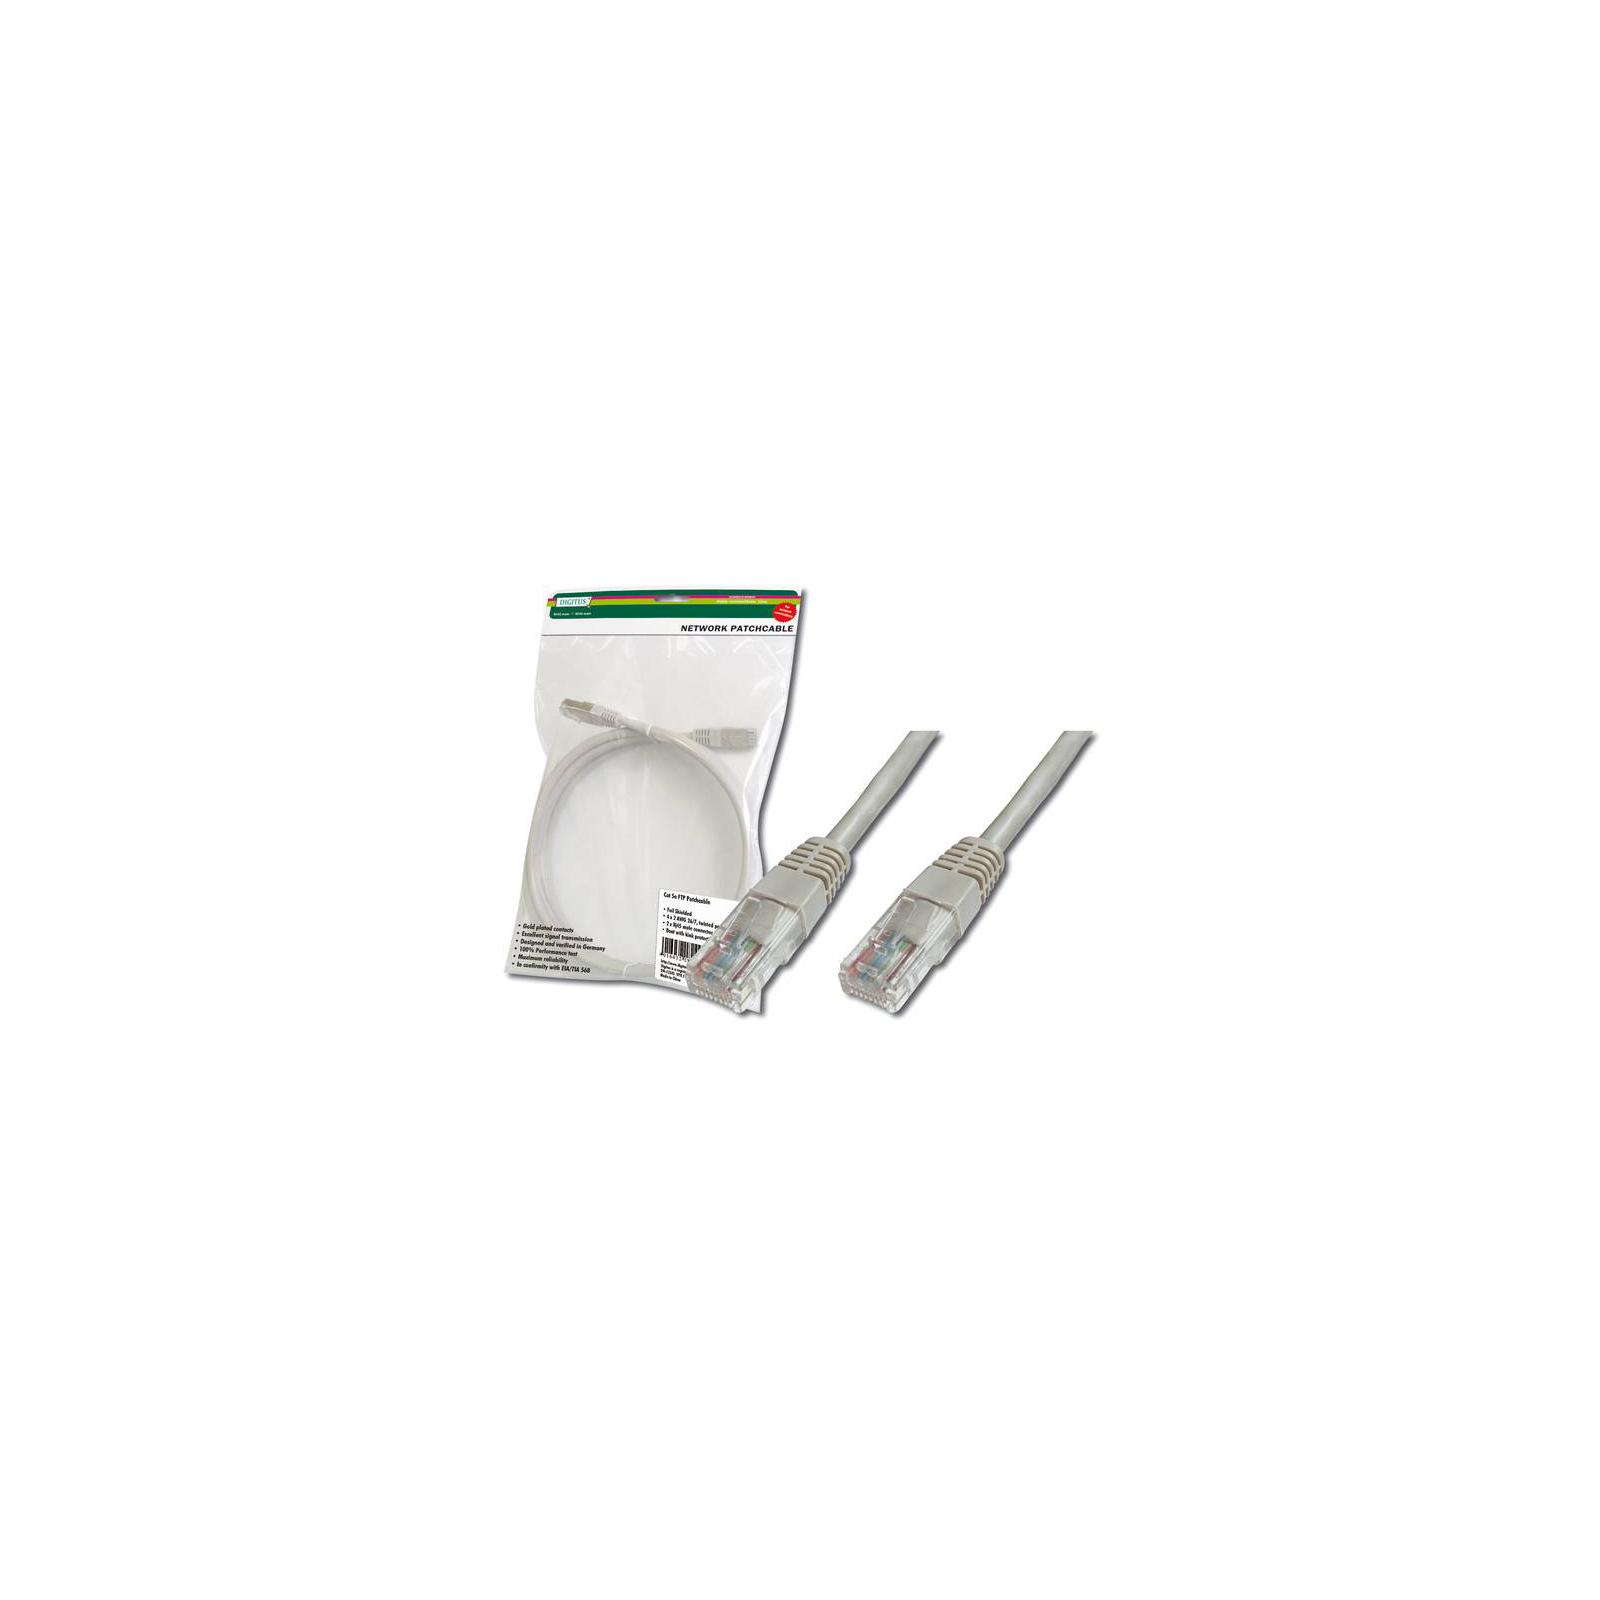 Патч-корд DIGITUS 3м, CAT 6 UTP, AWG 26/7, PVC (DK-1614-030)